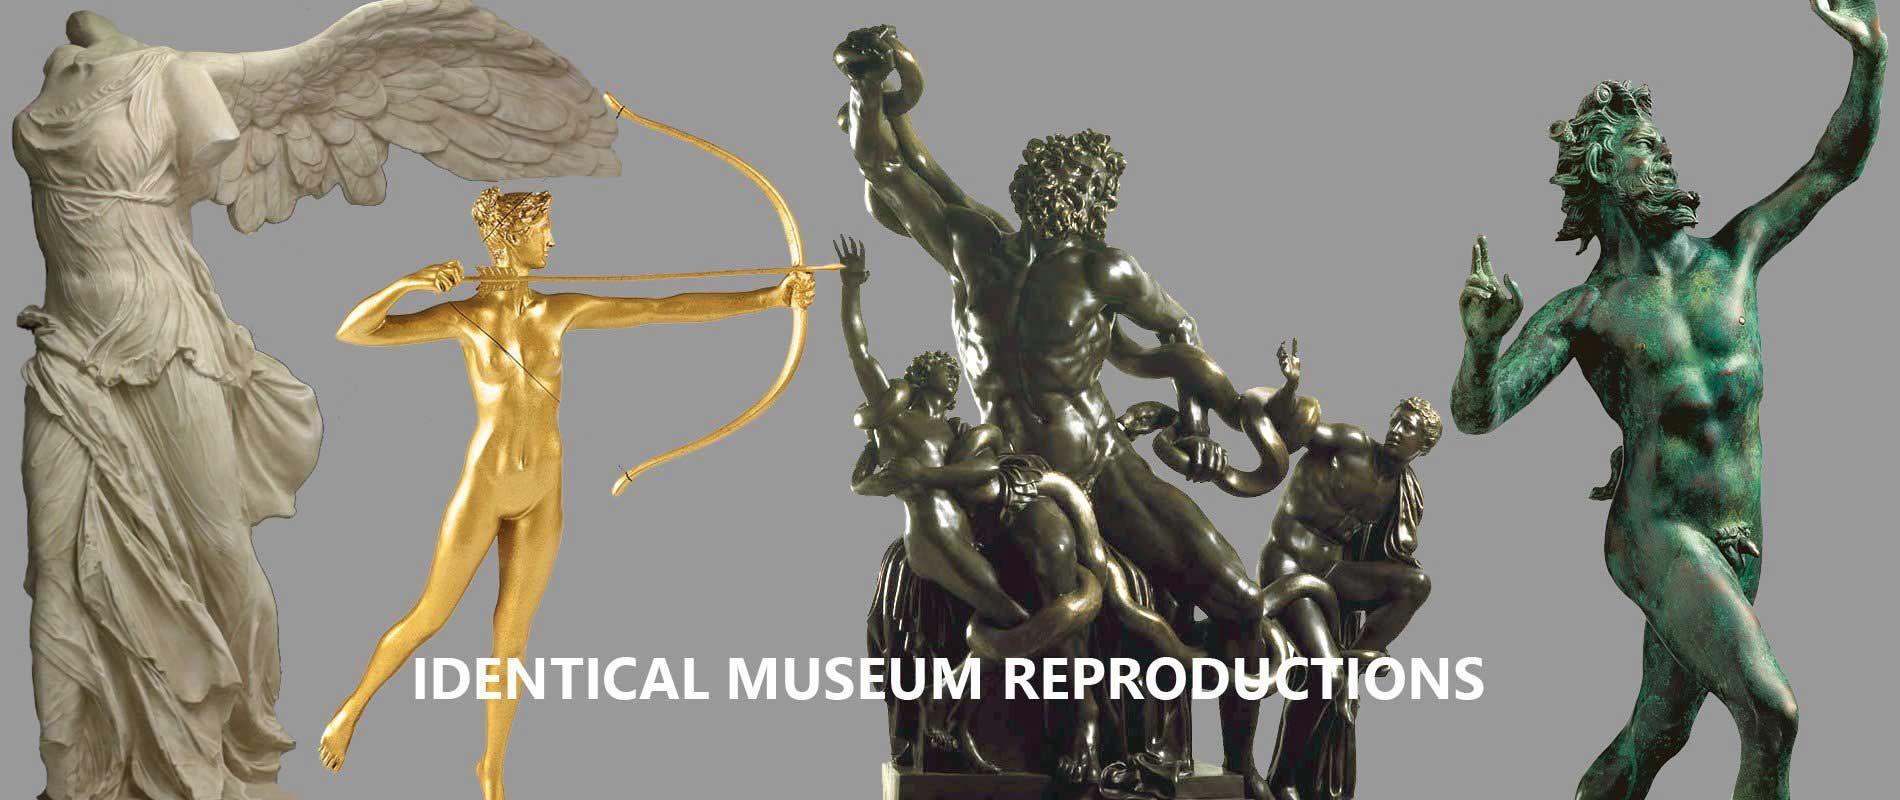 Modern Sculpture Reproductions